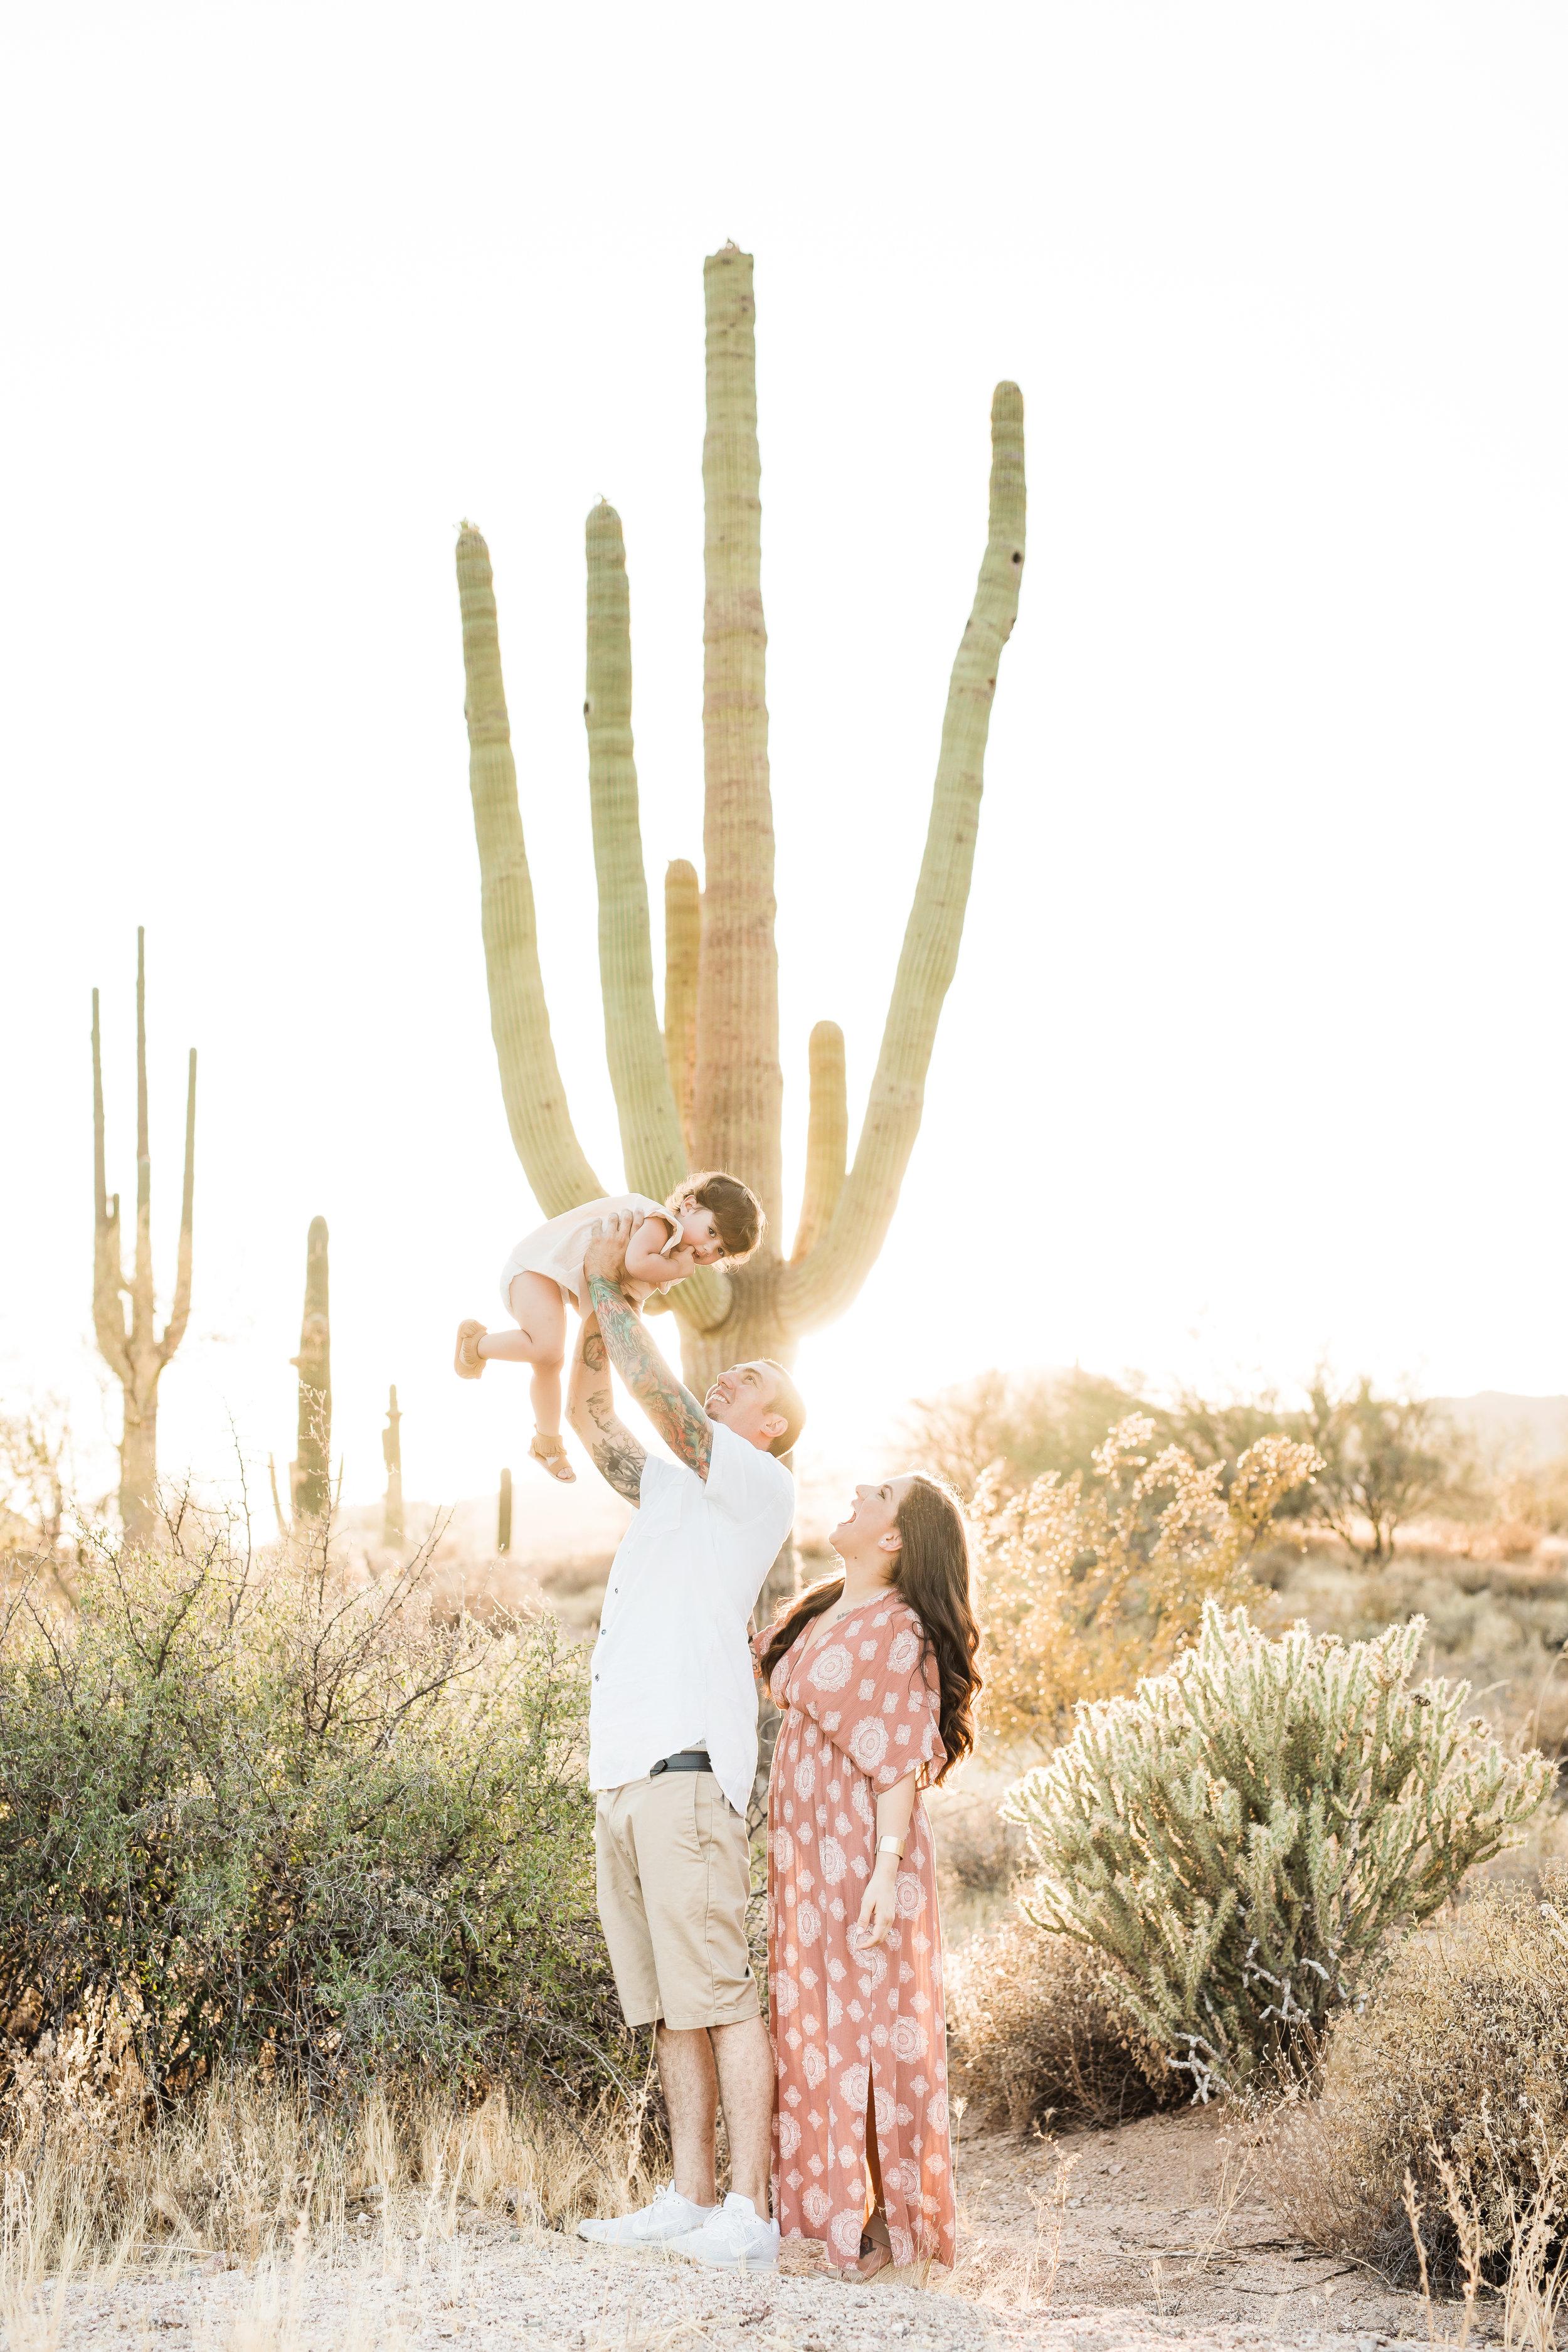 Lindsay-Borg-Photography-Arizona-60.jpg